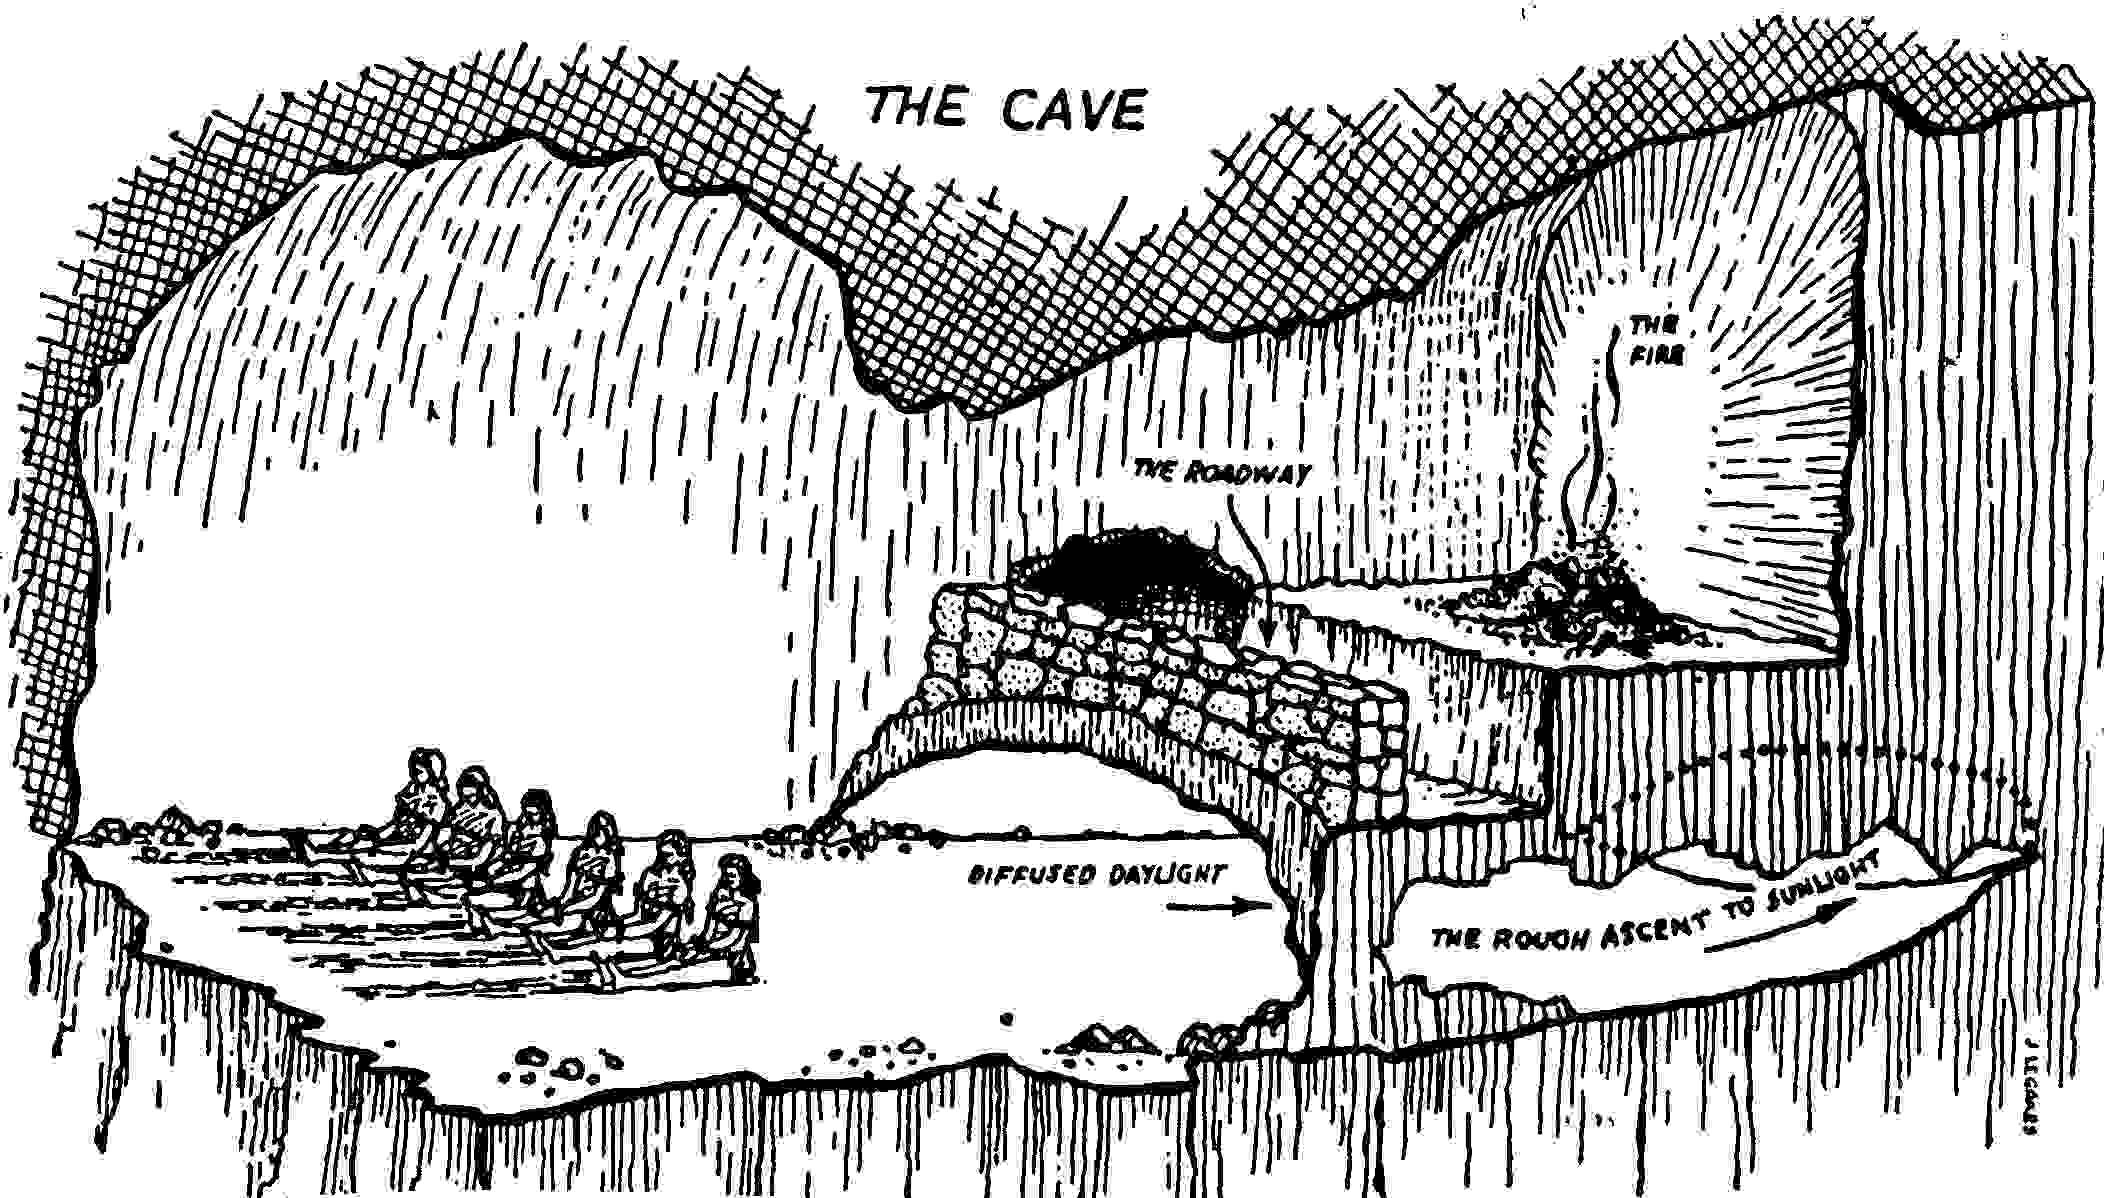 plato cave hledat googlem philosophy pinterest cave